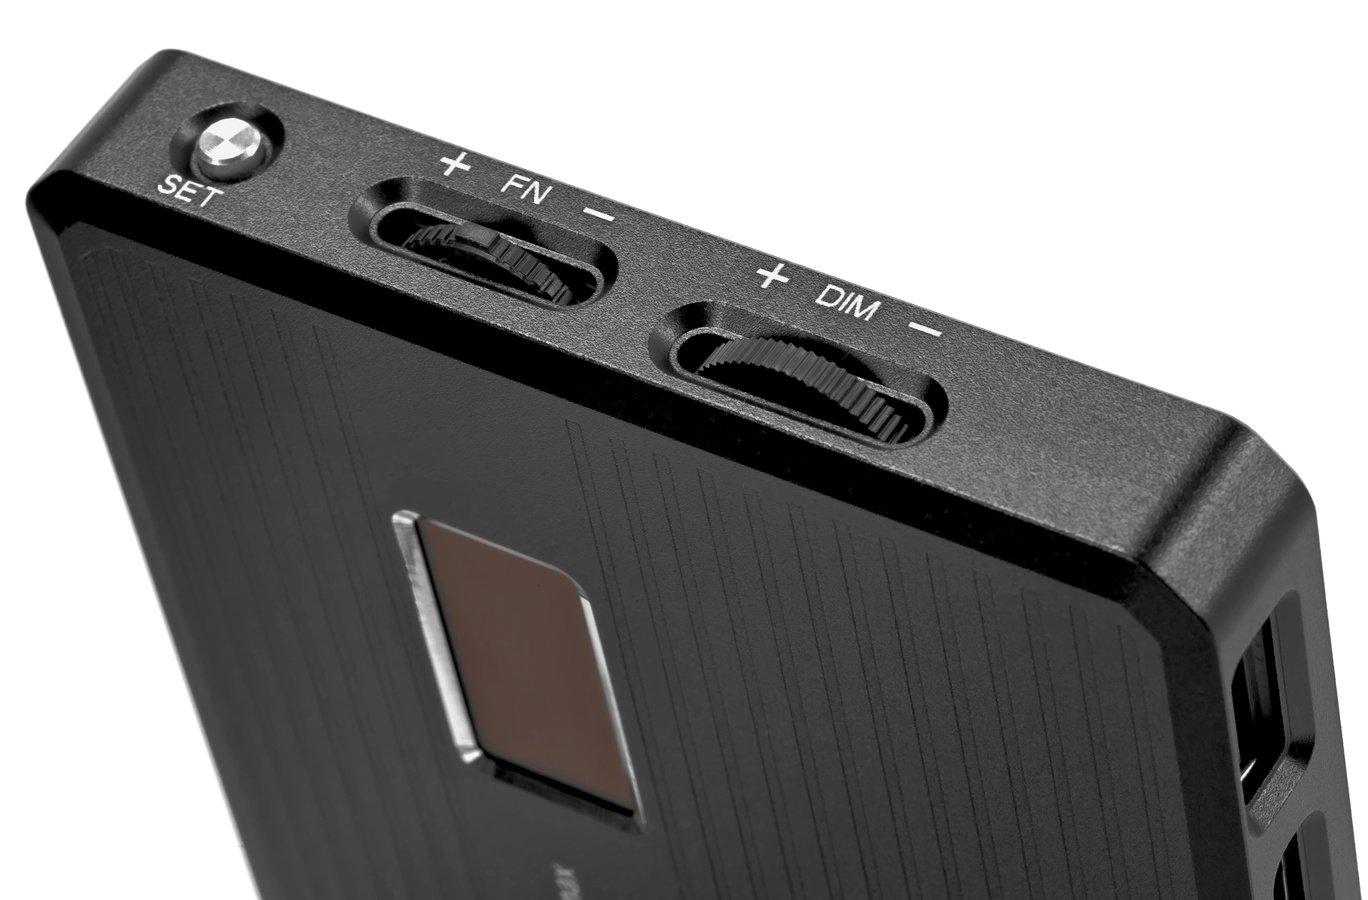 SmallRig 3157 Pix M160 RGB LED Kameraleuchte mit eingebautem Akku Foto Nr. 3